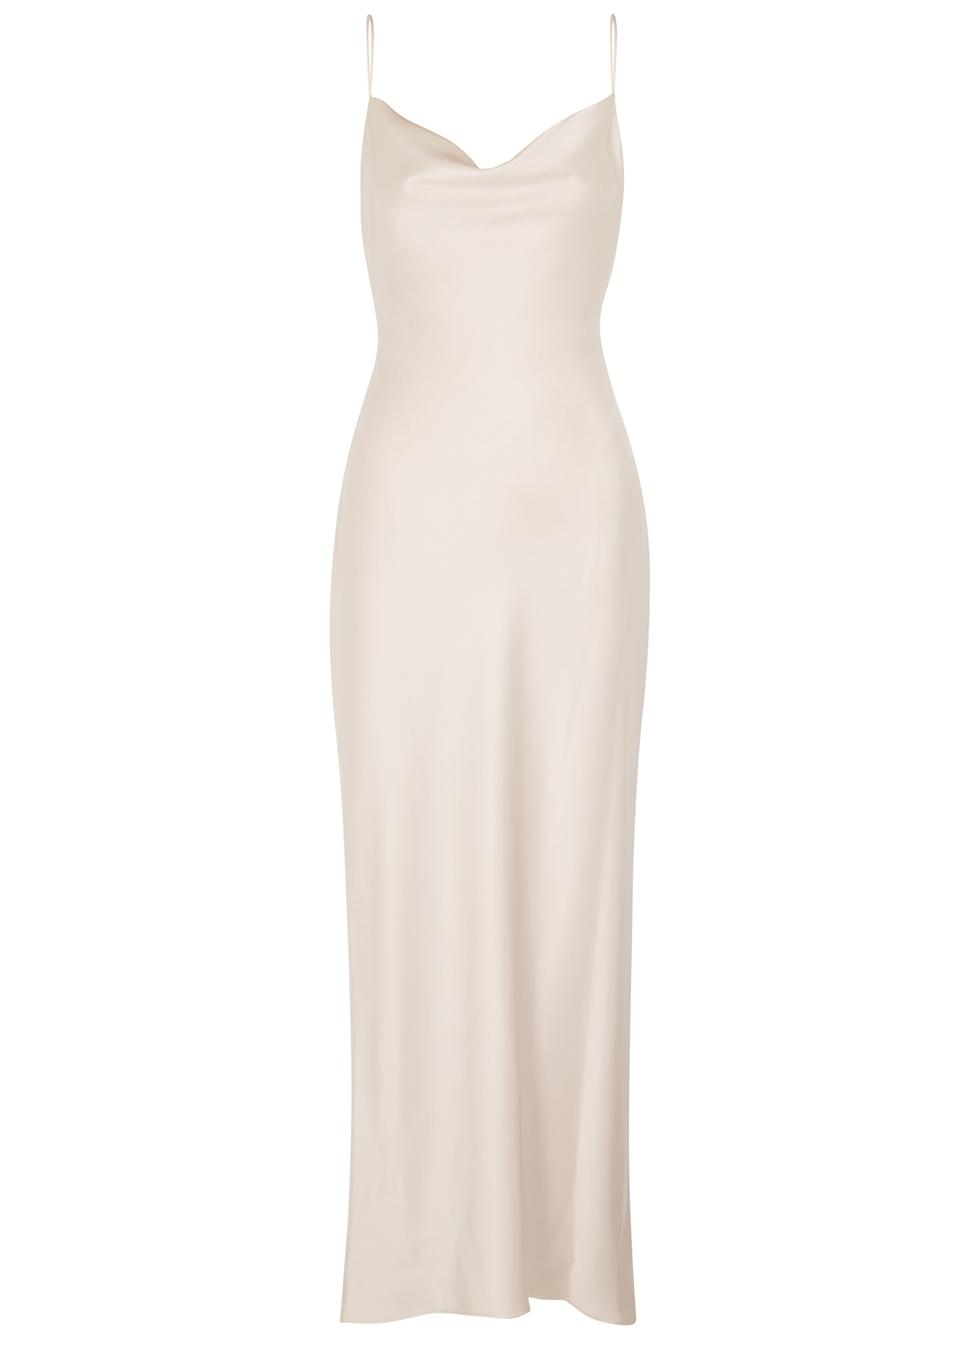 Harmony champagne satin dress